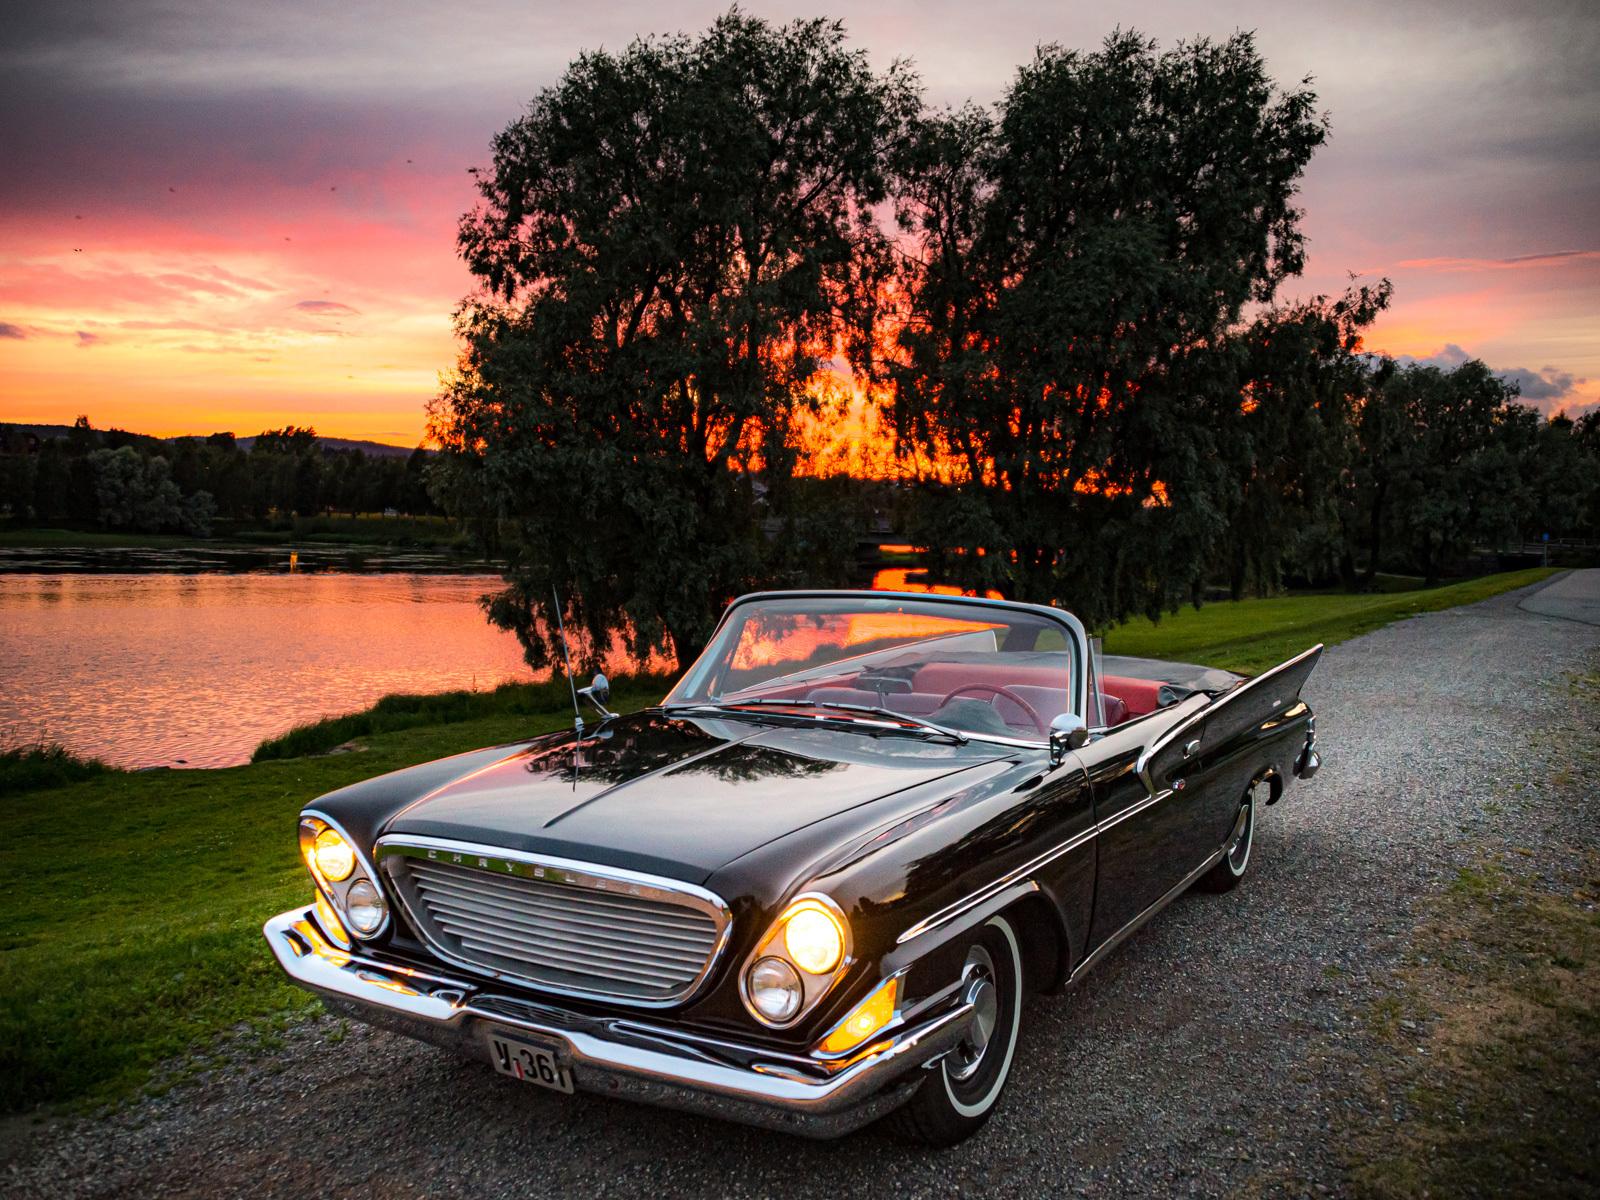 013-1961 Chrysler Newport Convertible 01. Eier- me